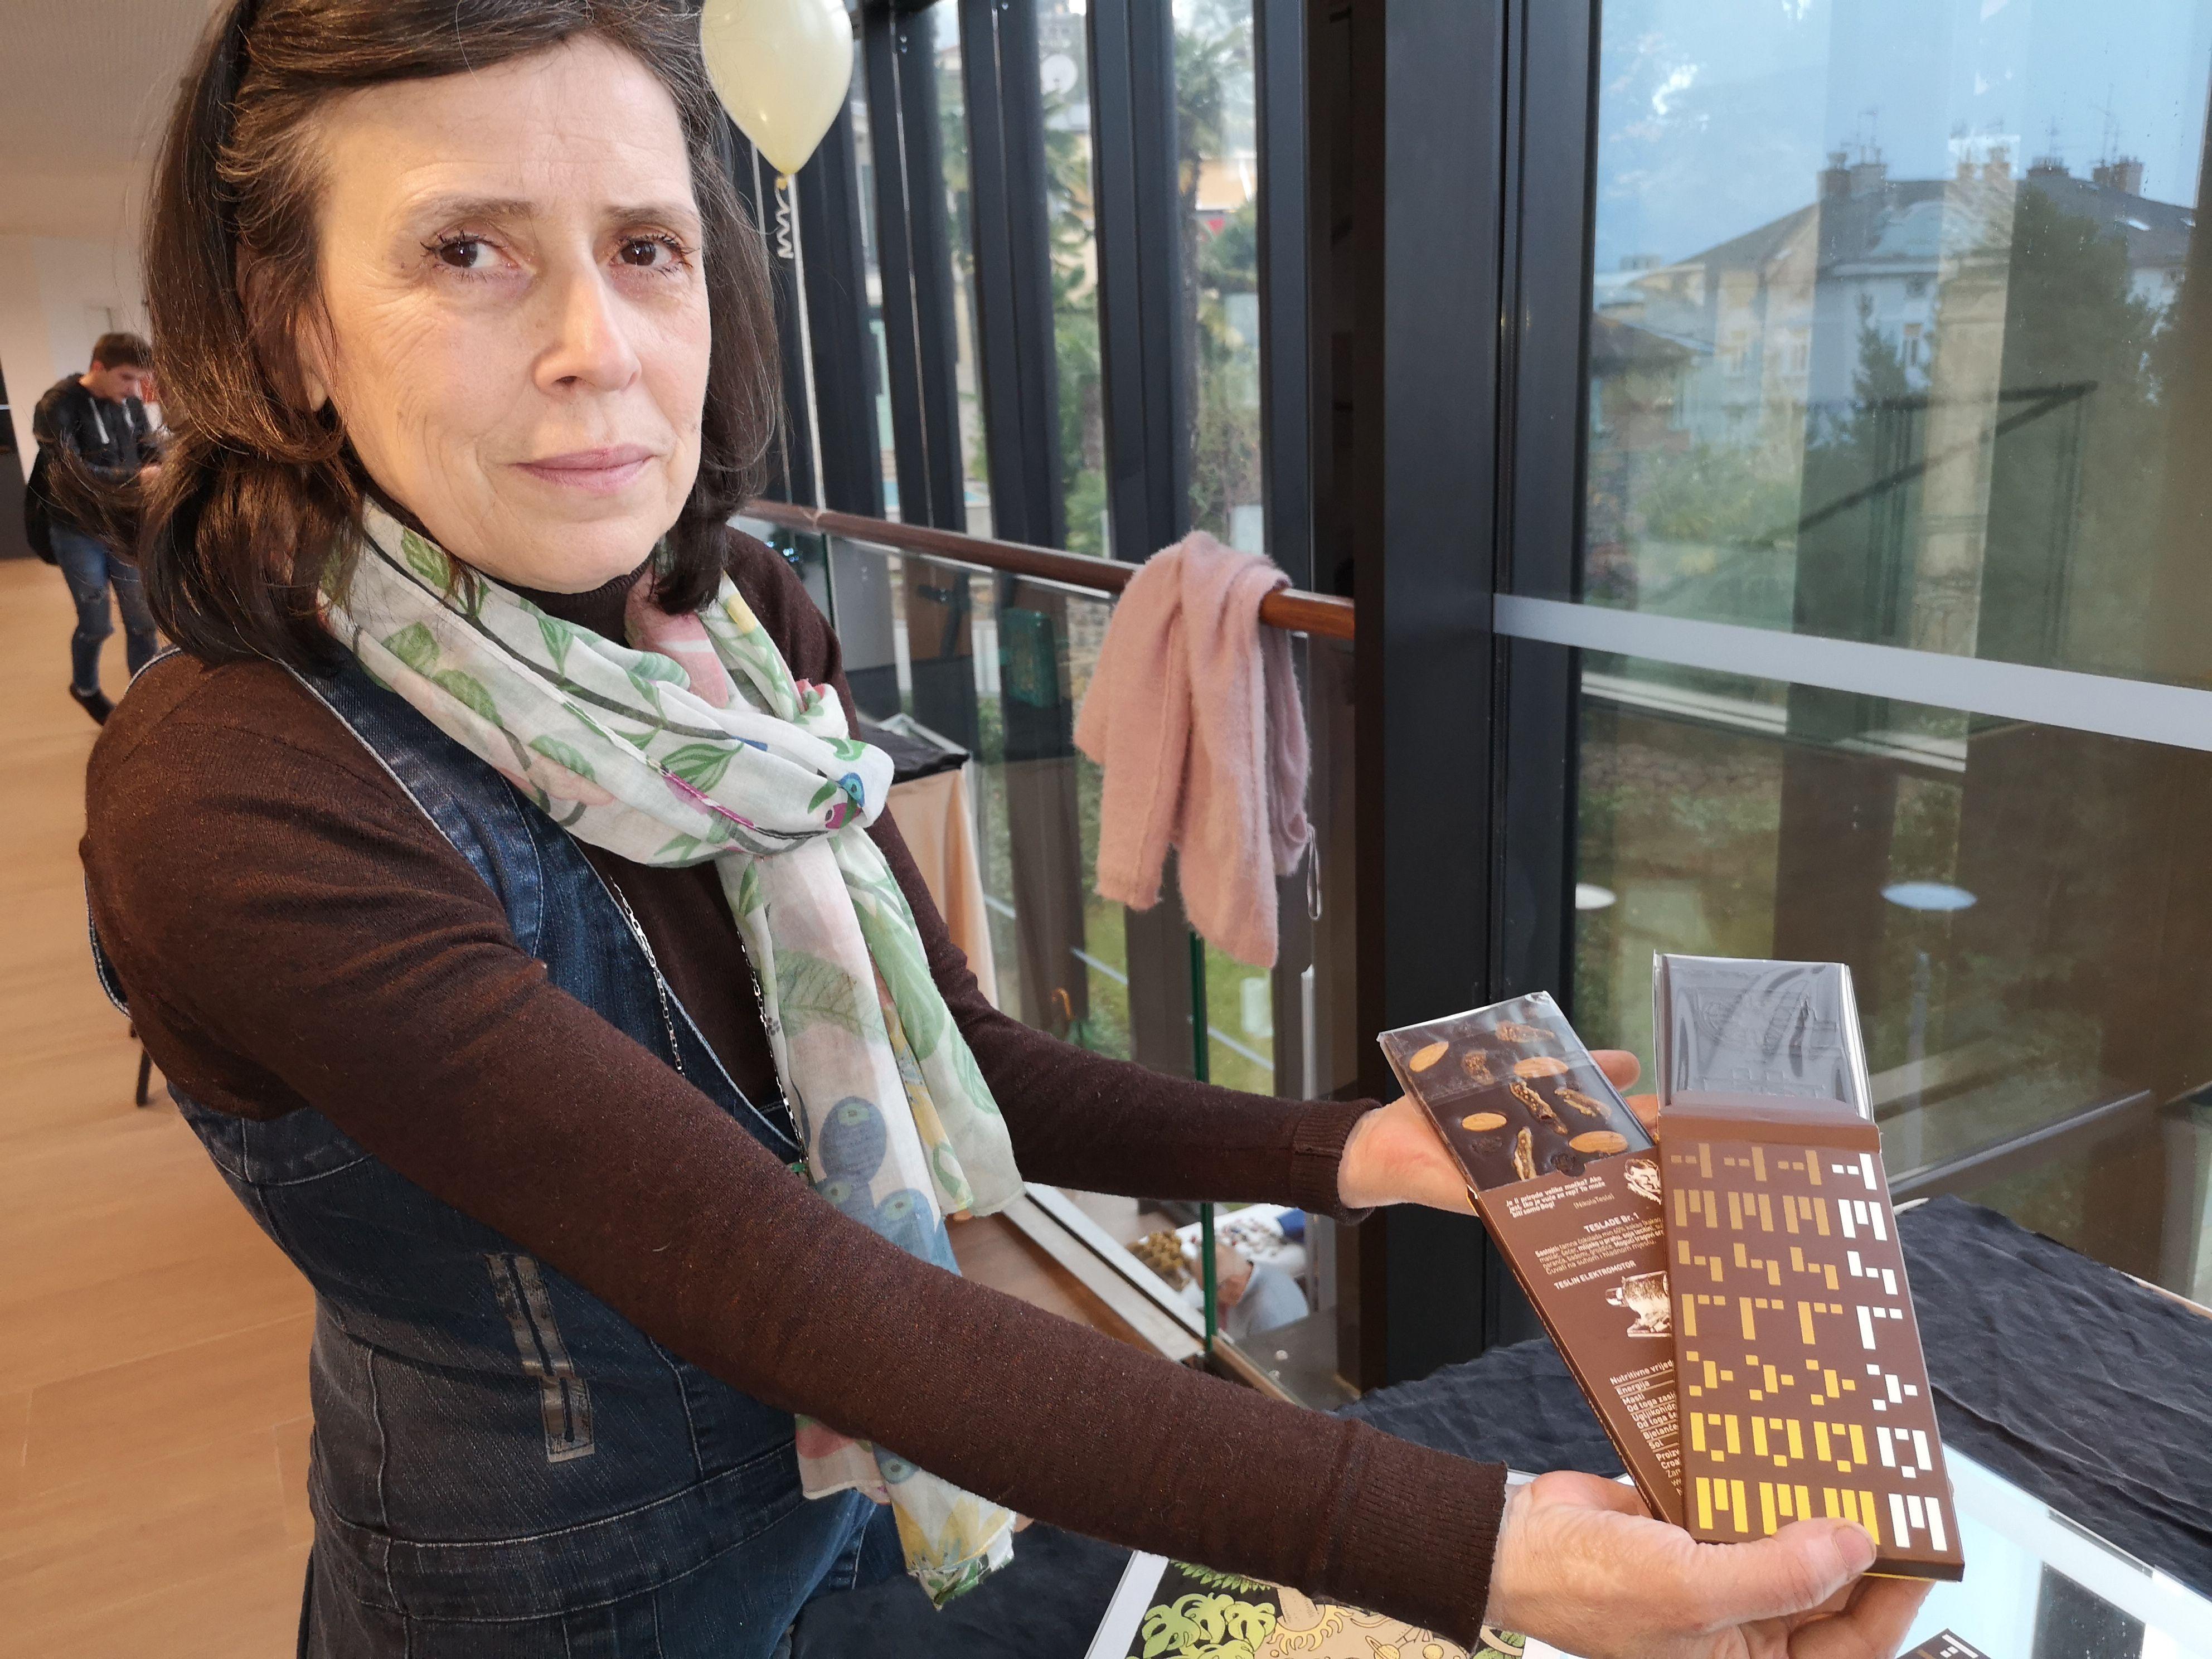 Marina Prijatelj s Tesladama, čokoladama posevećnima Nikoli Tesli / Snimila Marina KIRIGIN